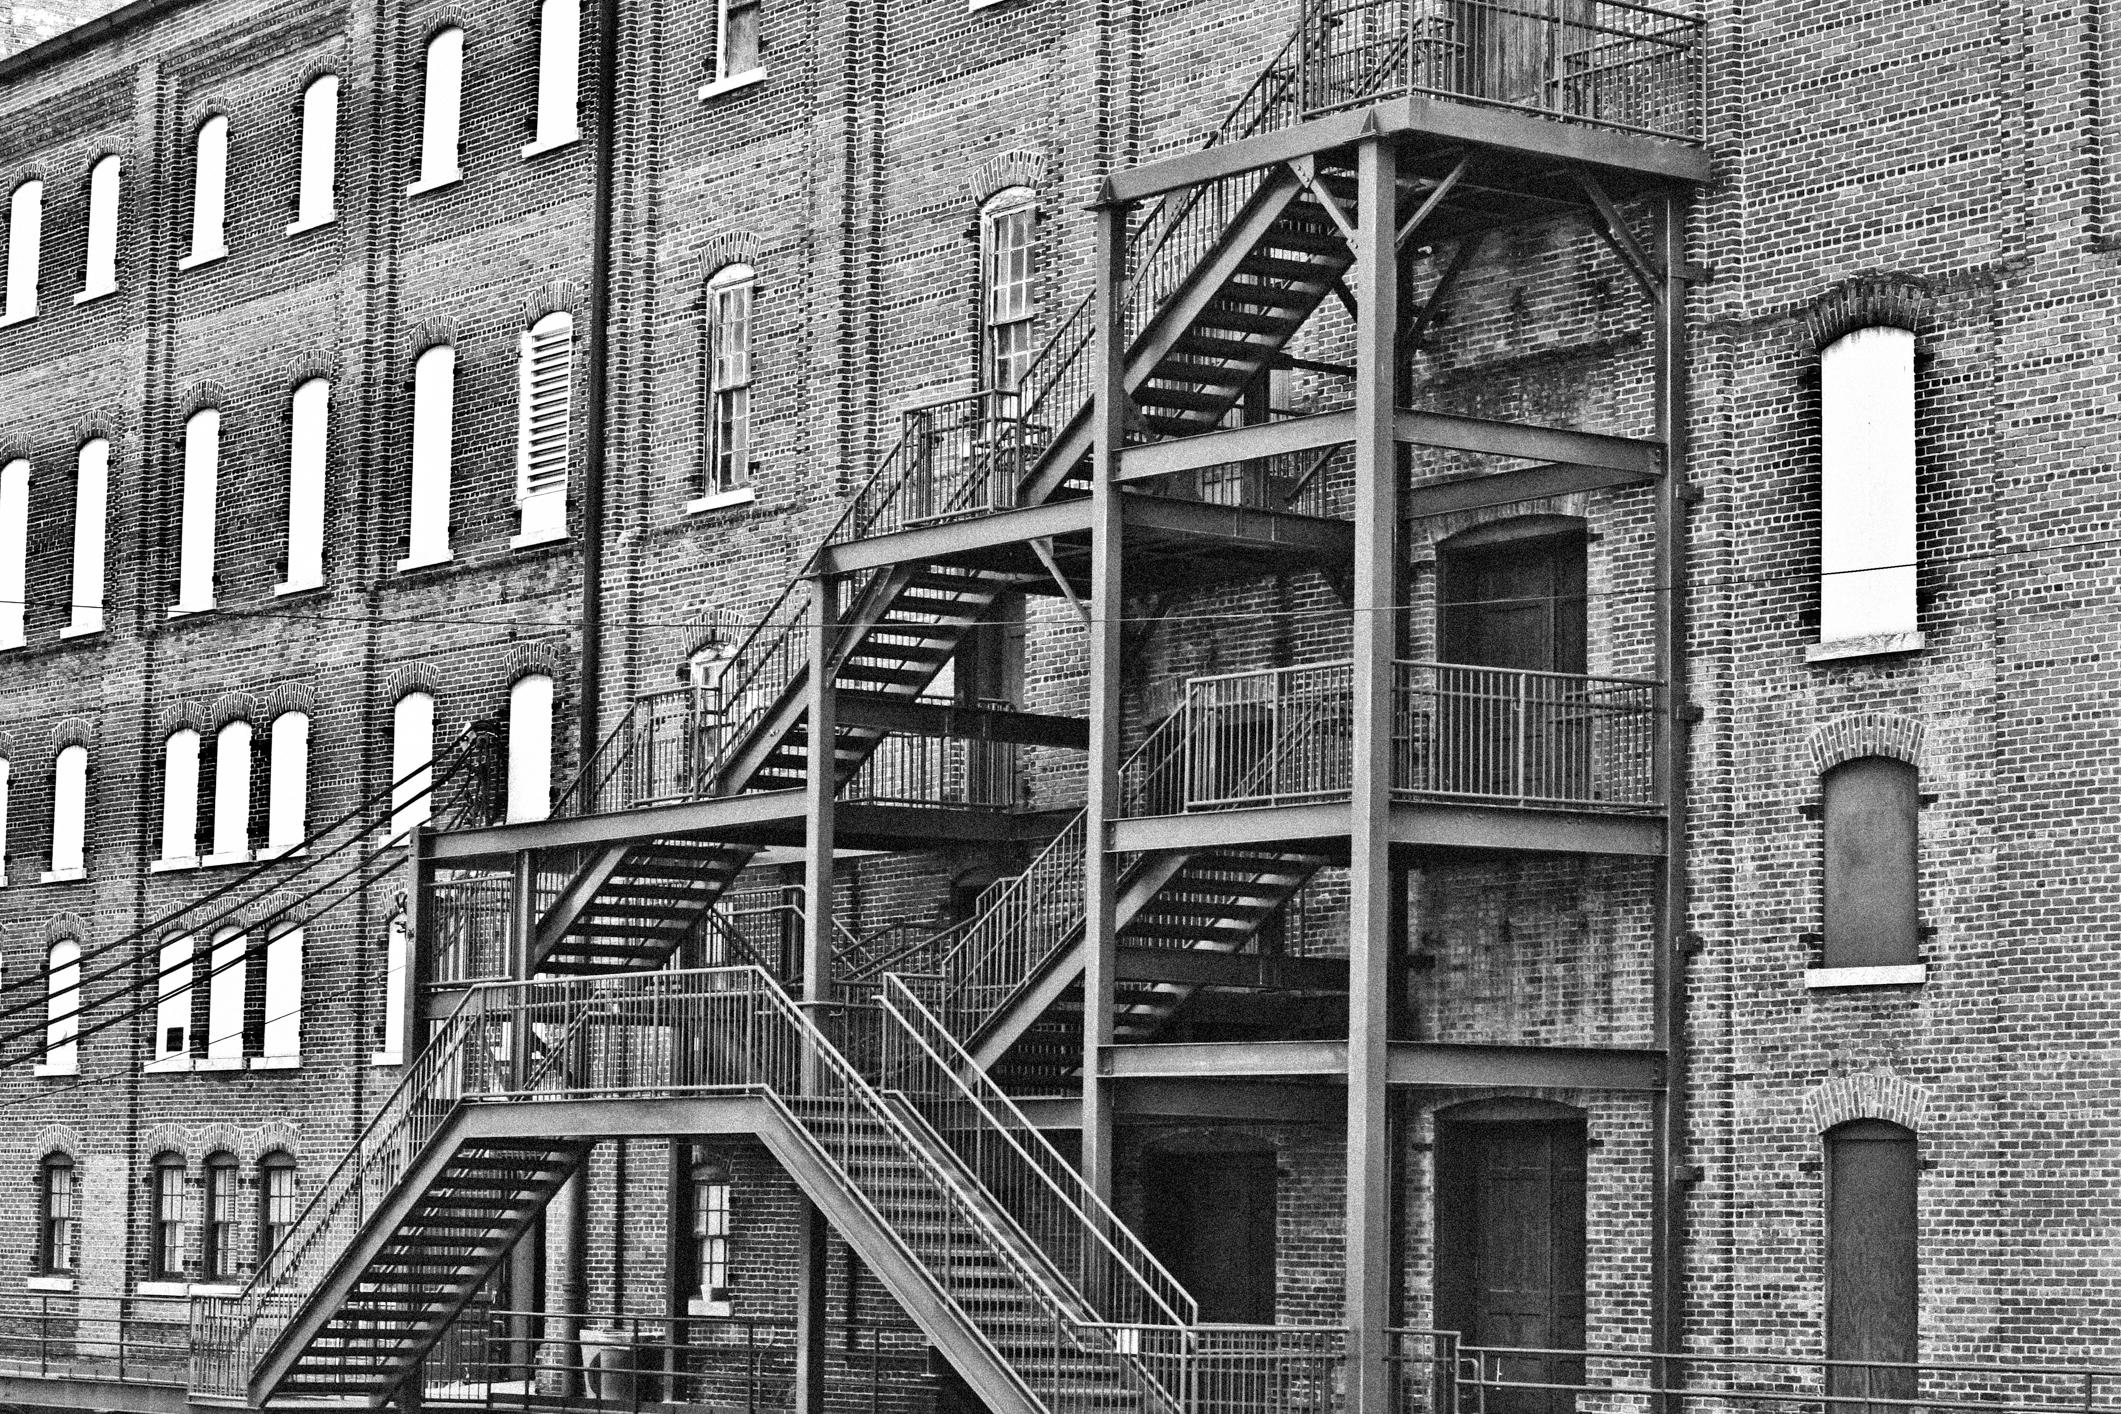 Great lines of a brick building NotSoSAHM